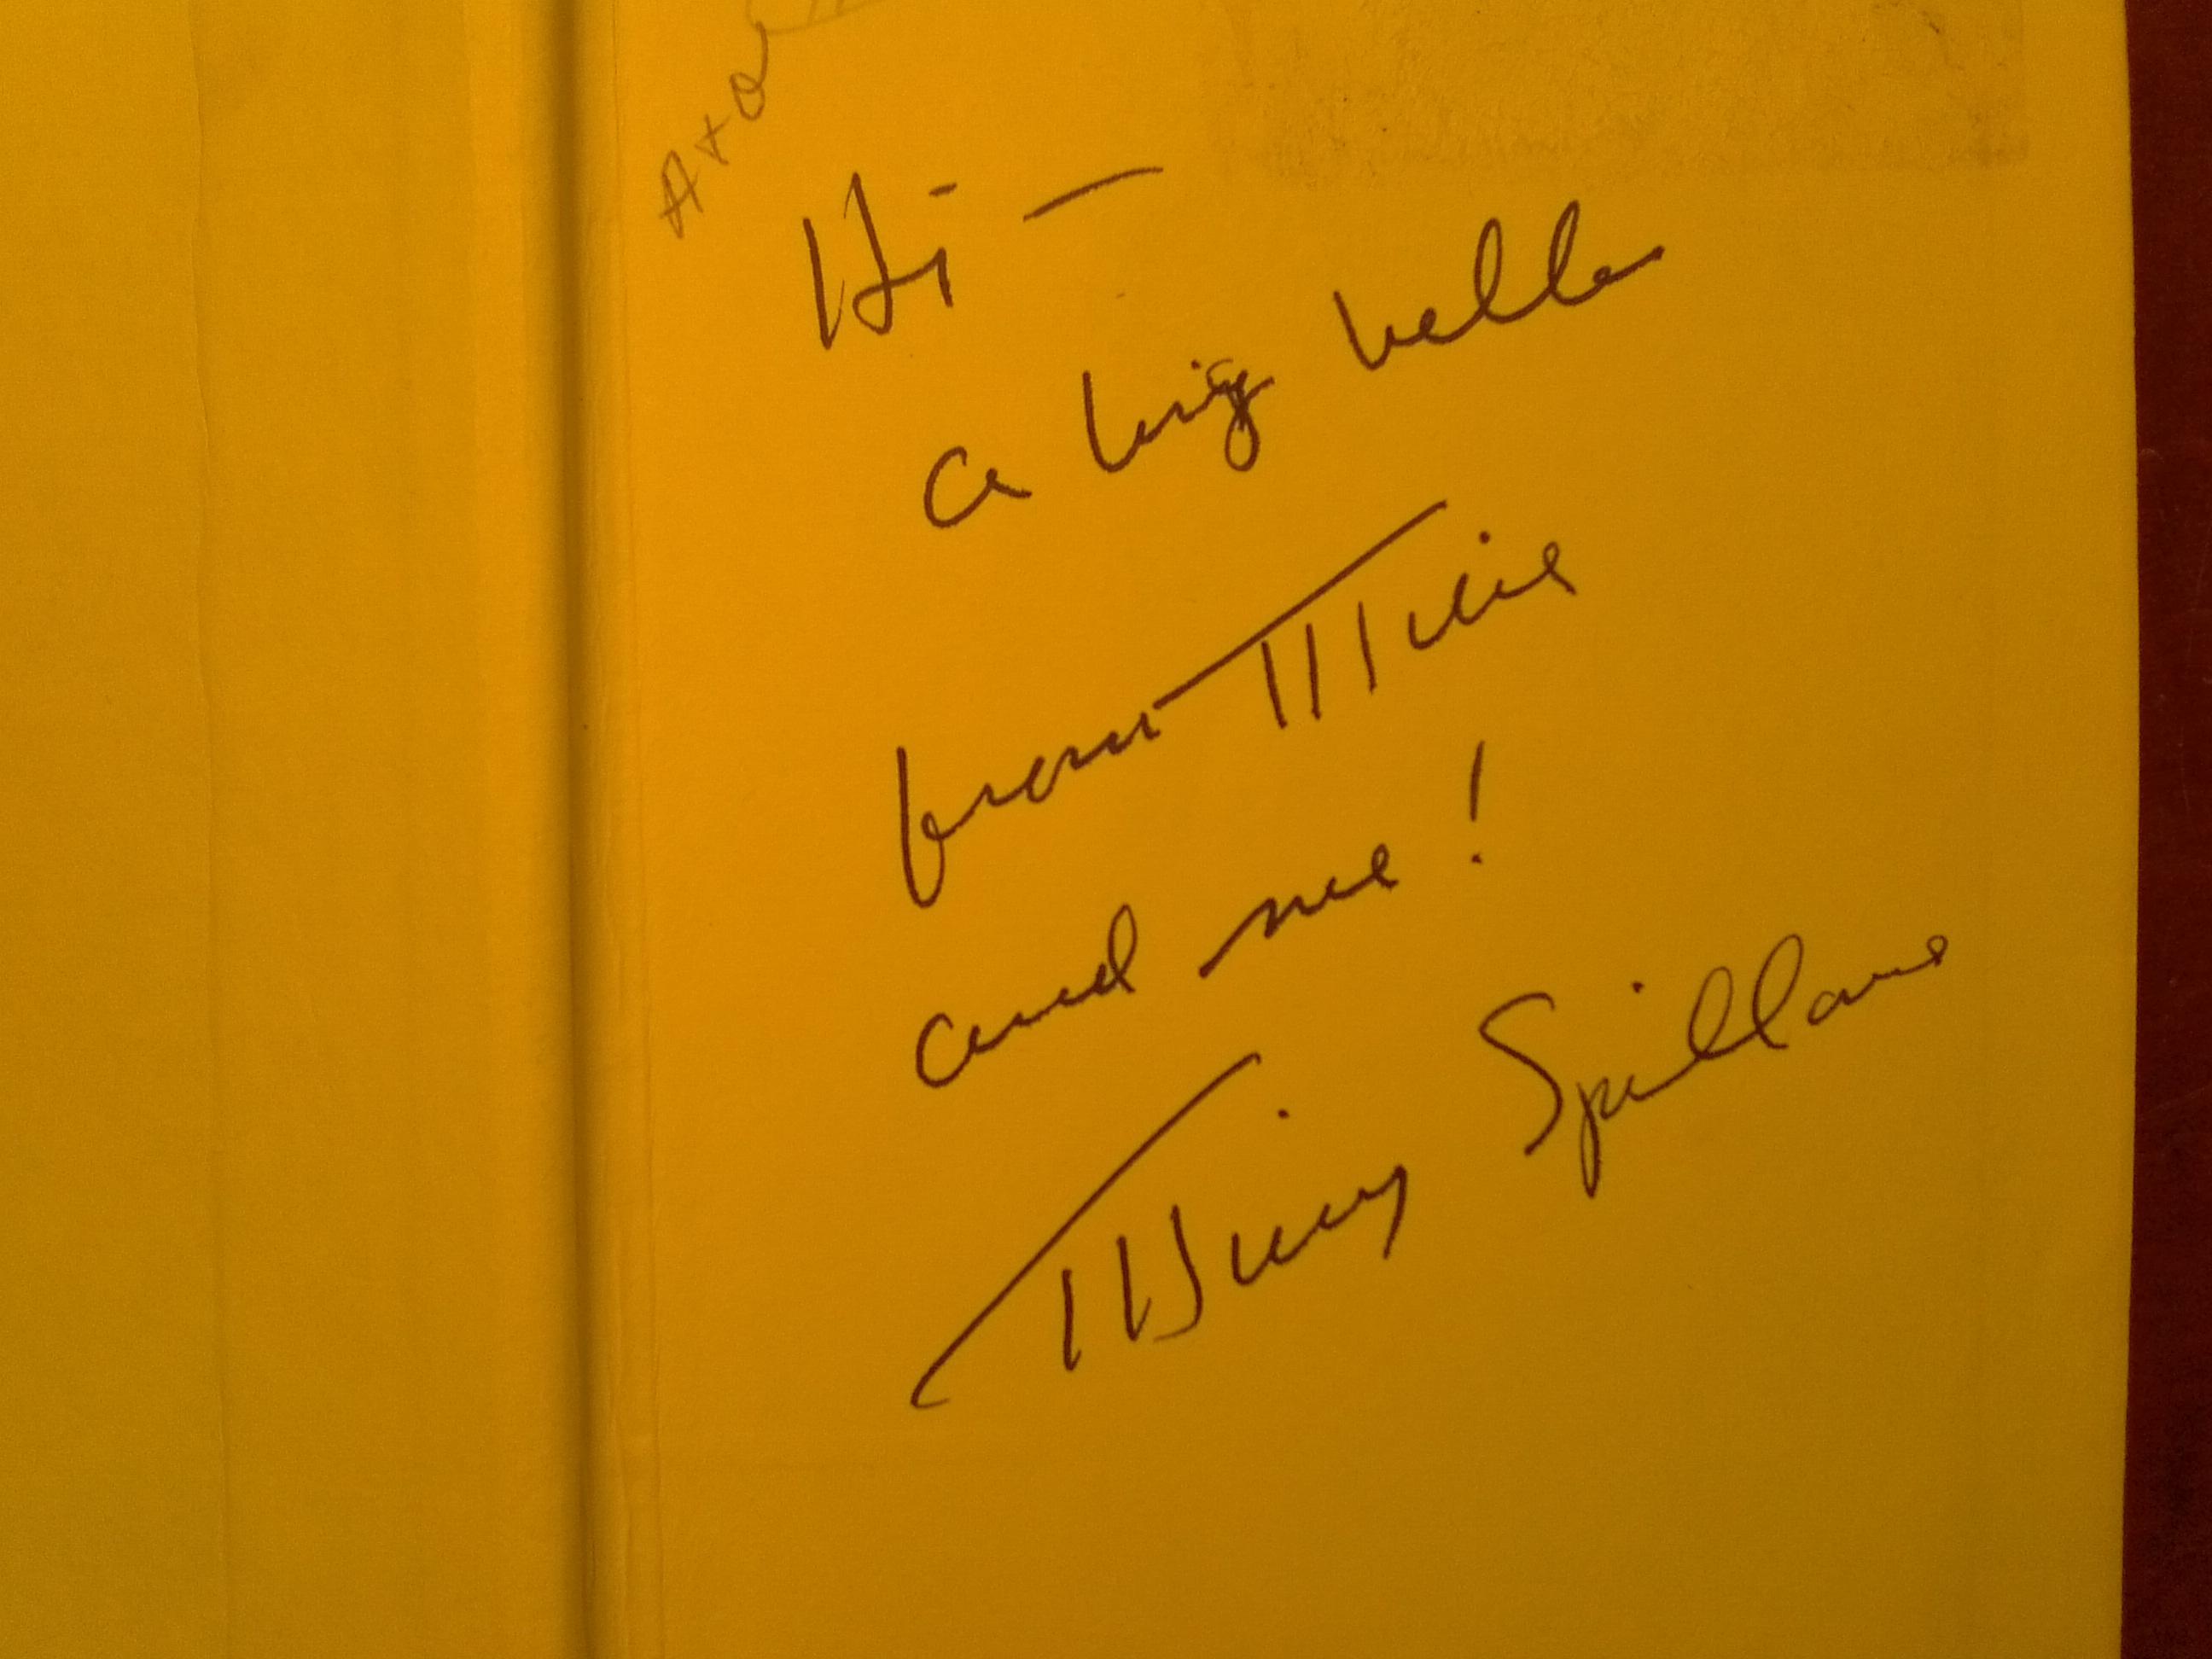 Mickey Spillane's Autograph